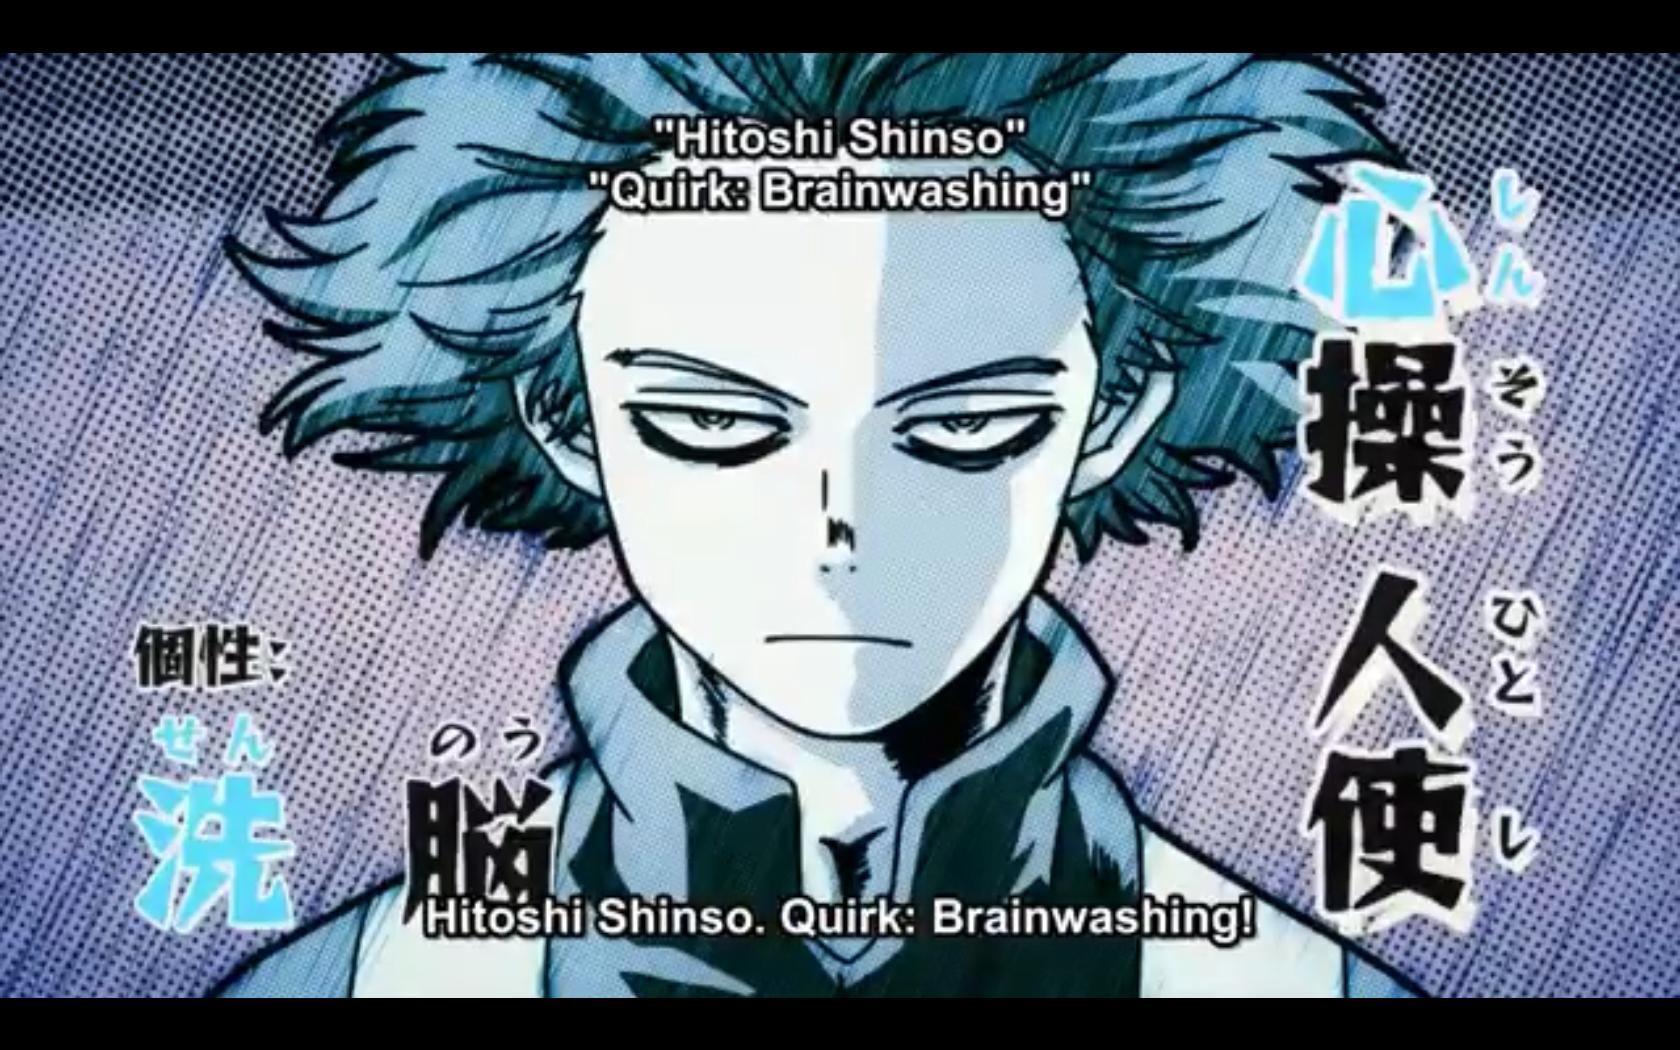 Boku no hero academia 2nd season episode 7 discussion